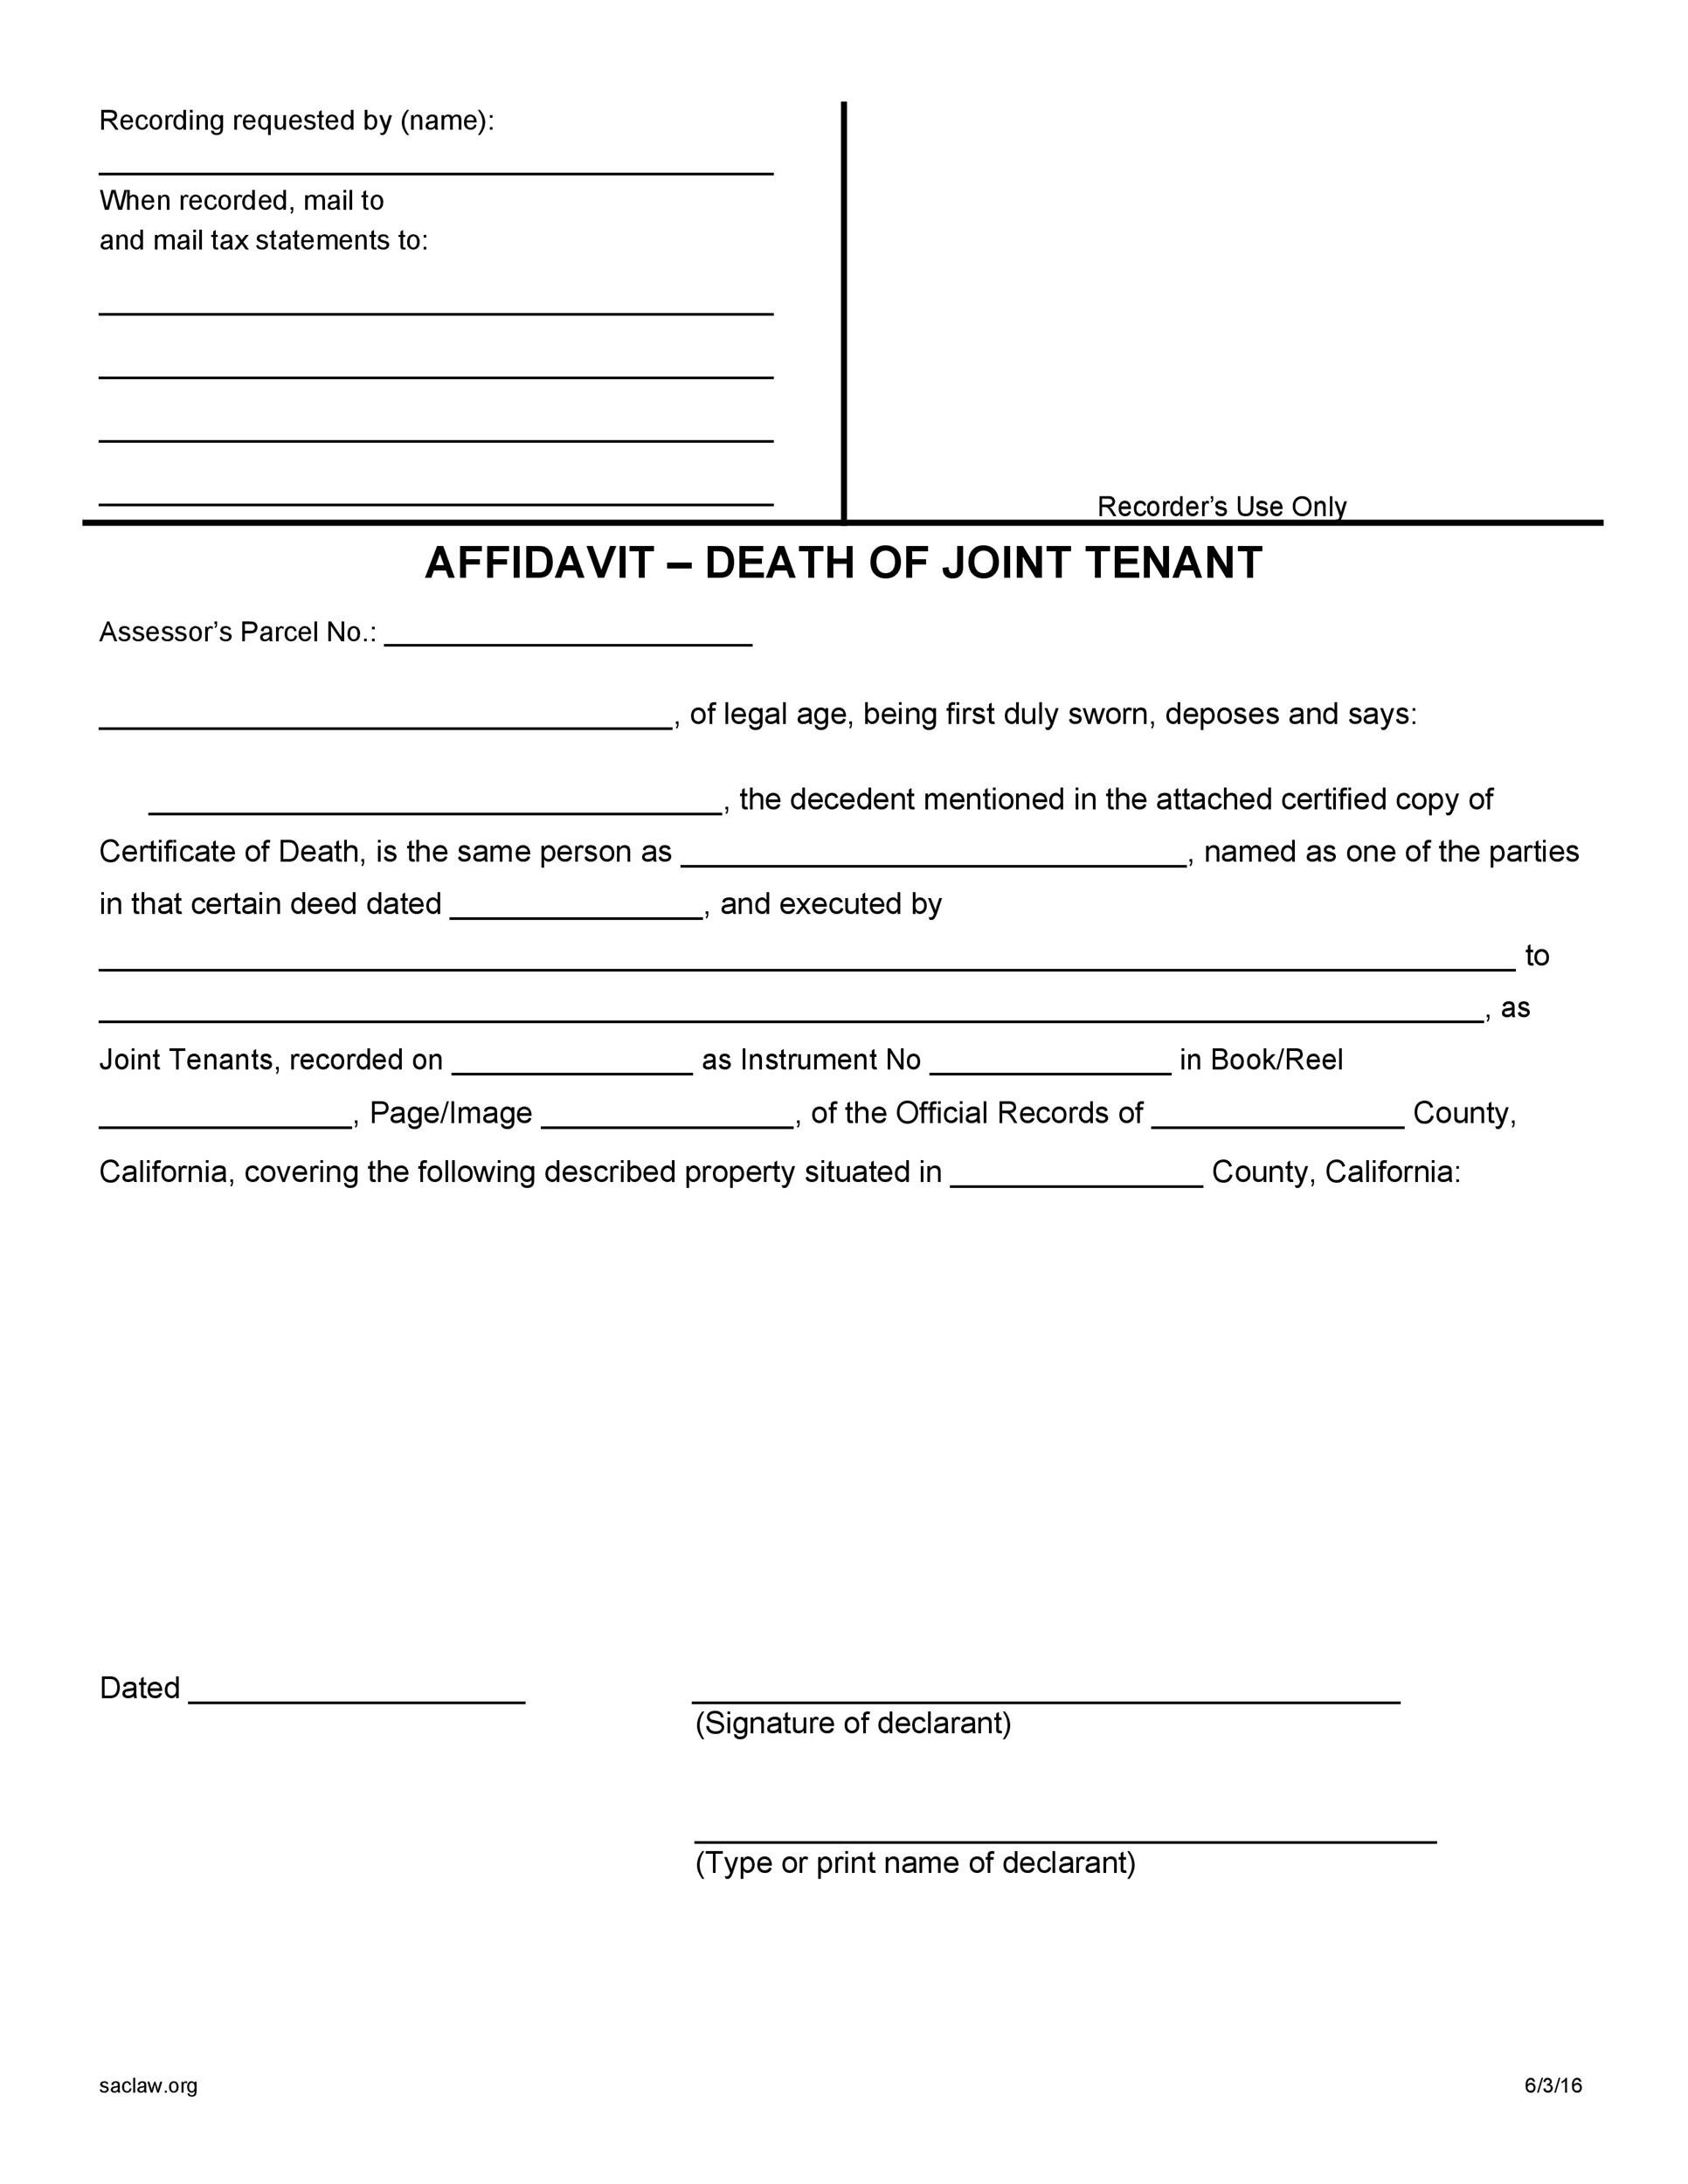 Free affidavit of death 39